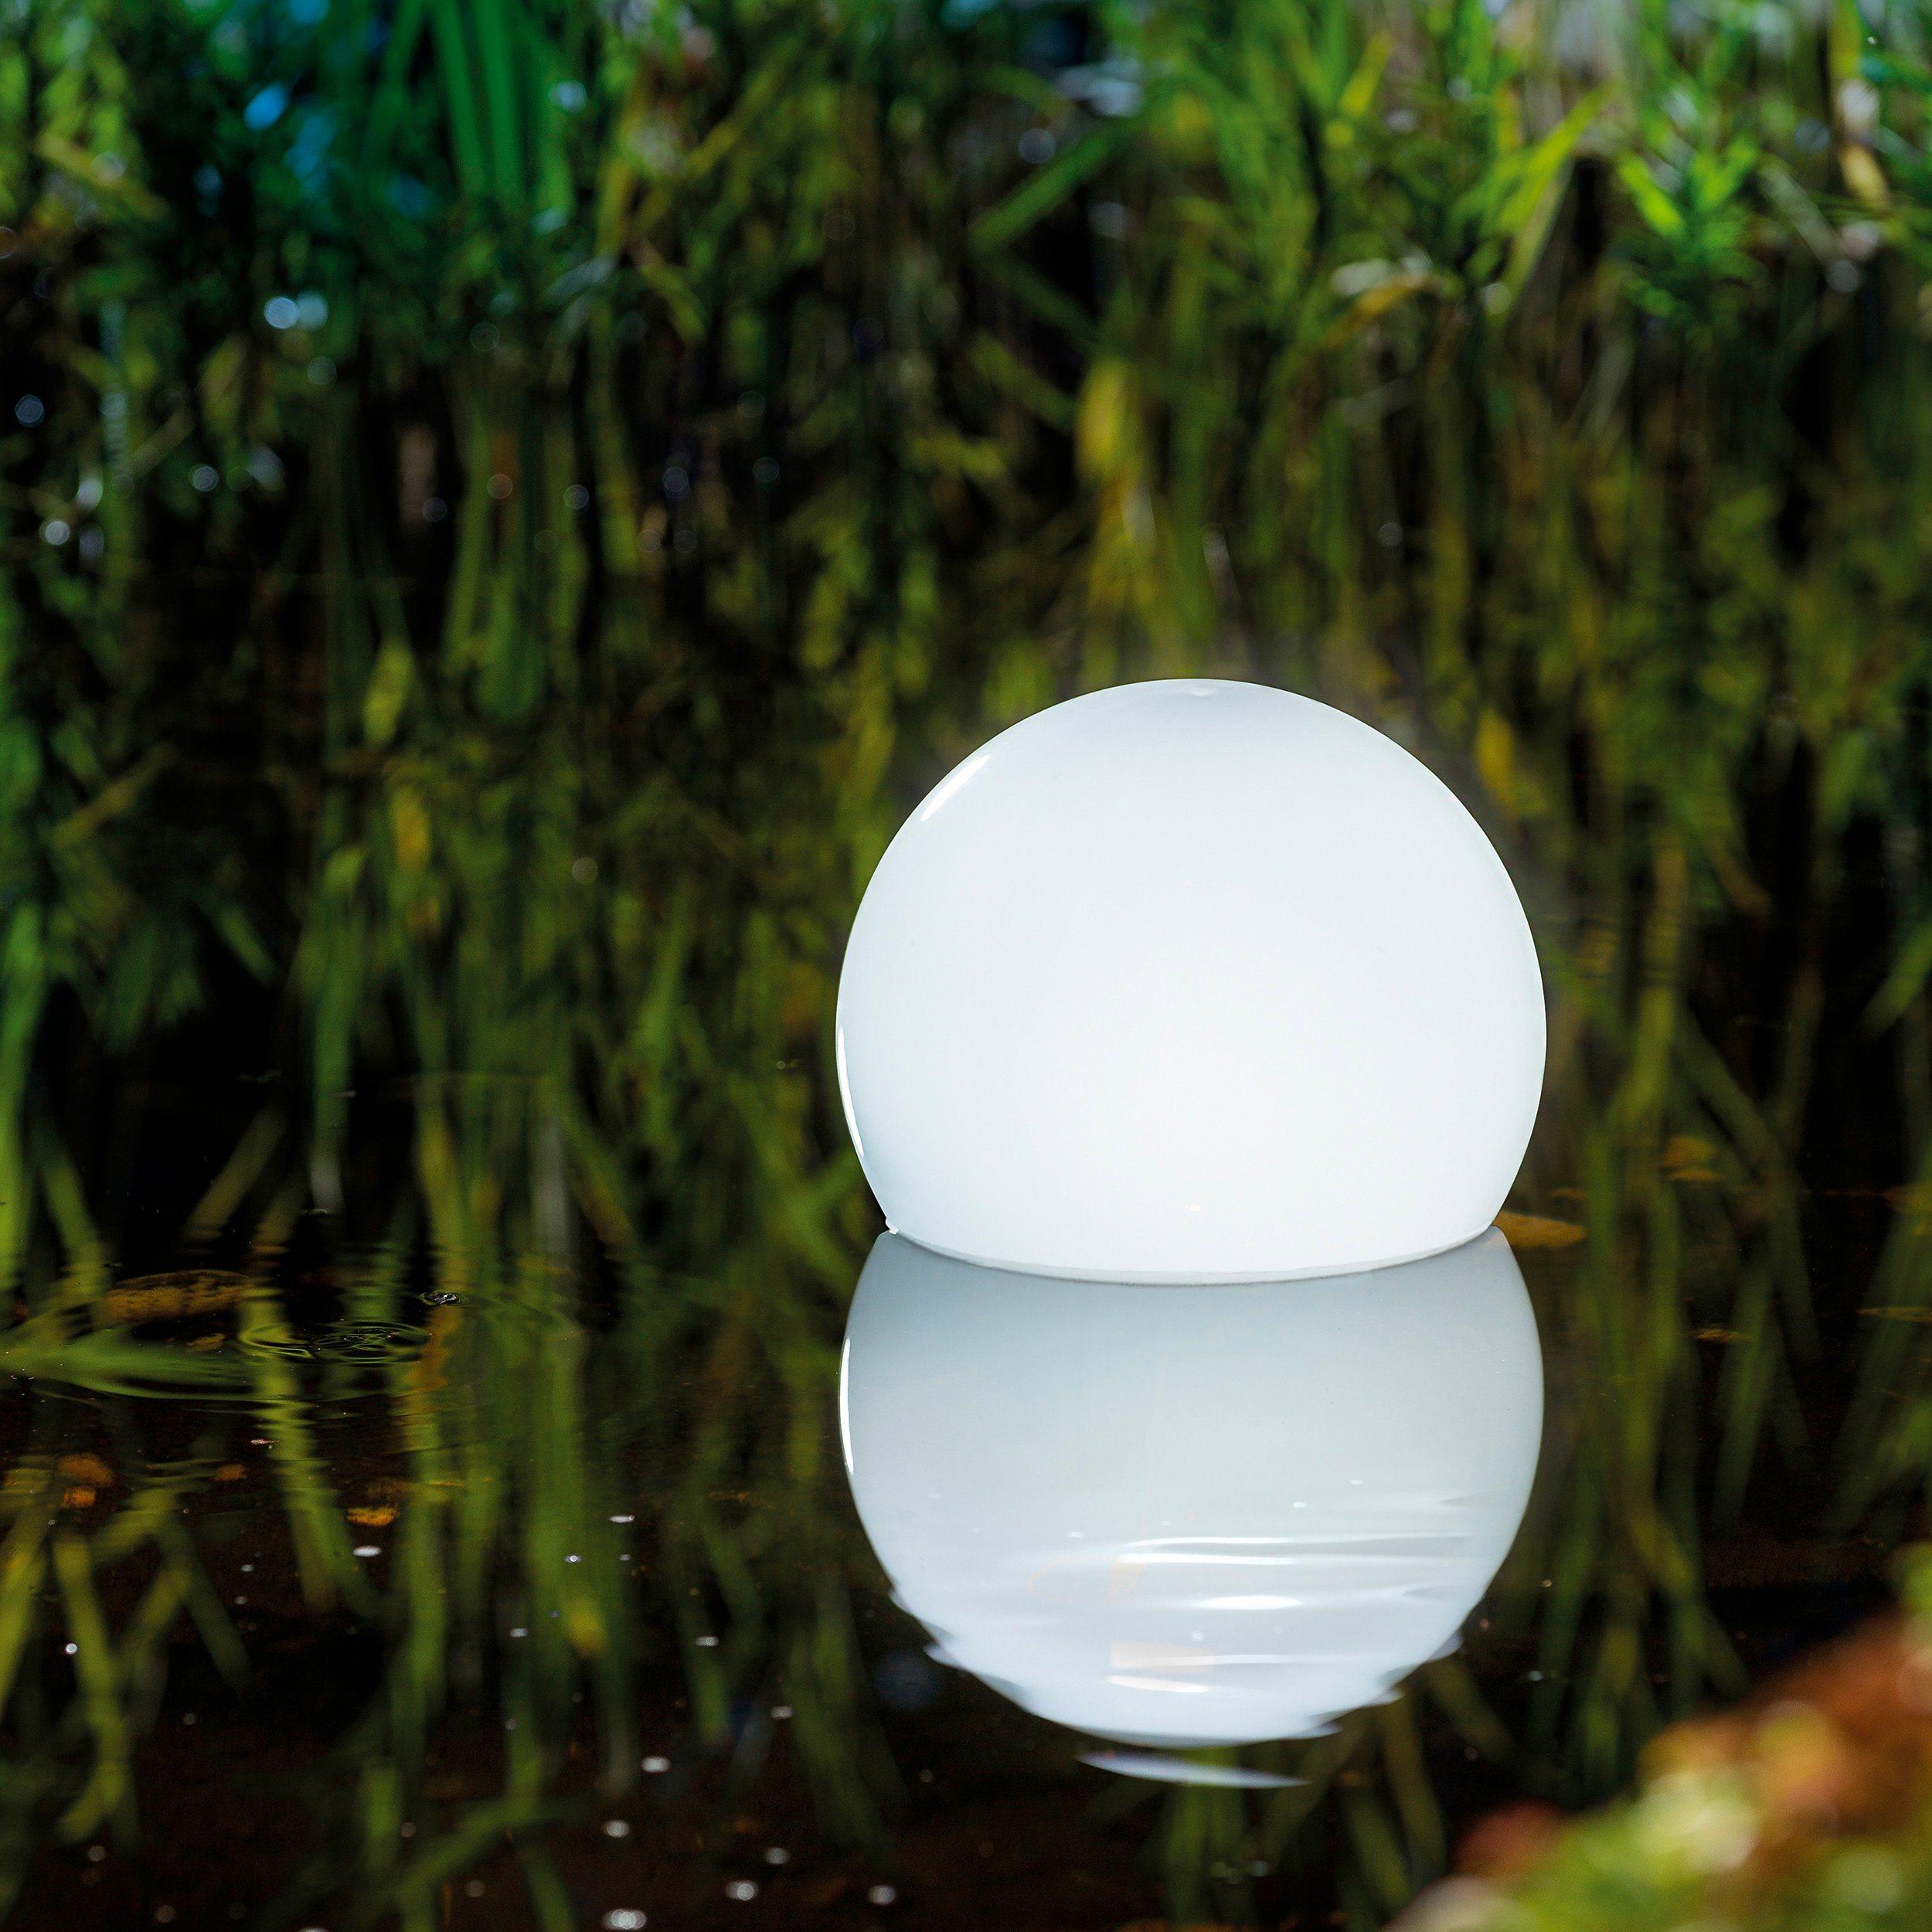 ESOTEC Solarleuchte »Float 25 multicolor«, Ø: 25 cm, schwimmfähig | Lampen > Aussenlampen > Solarleuchten | esotec